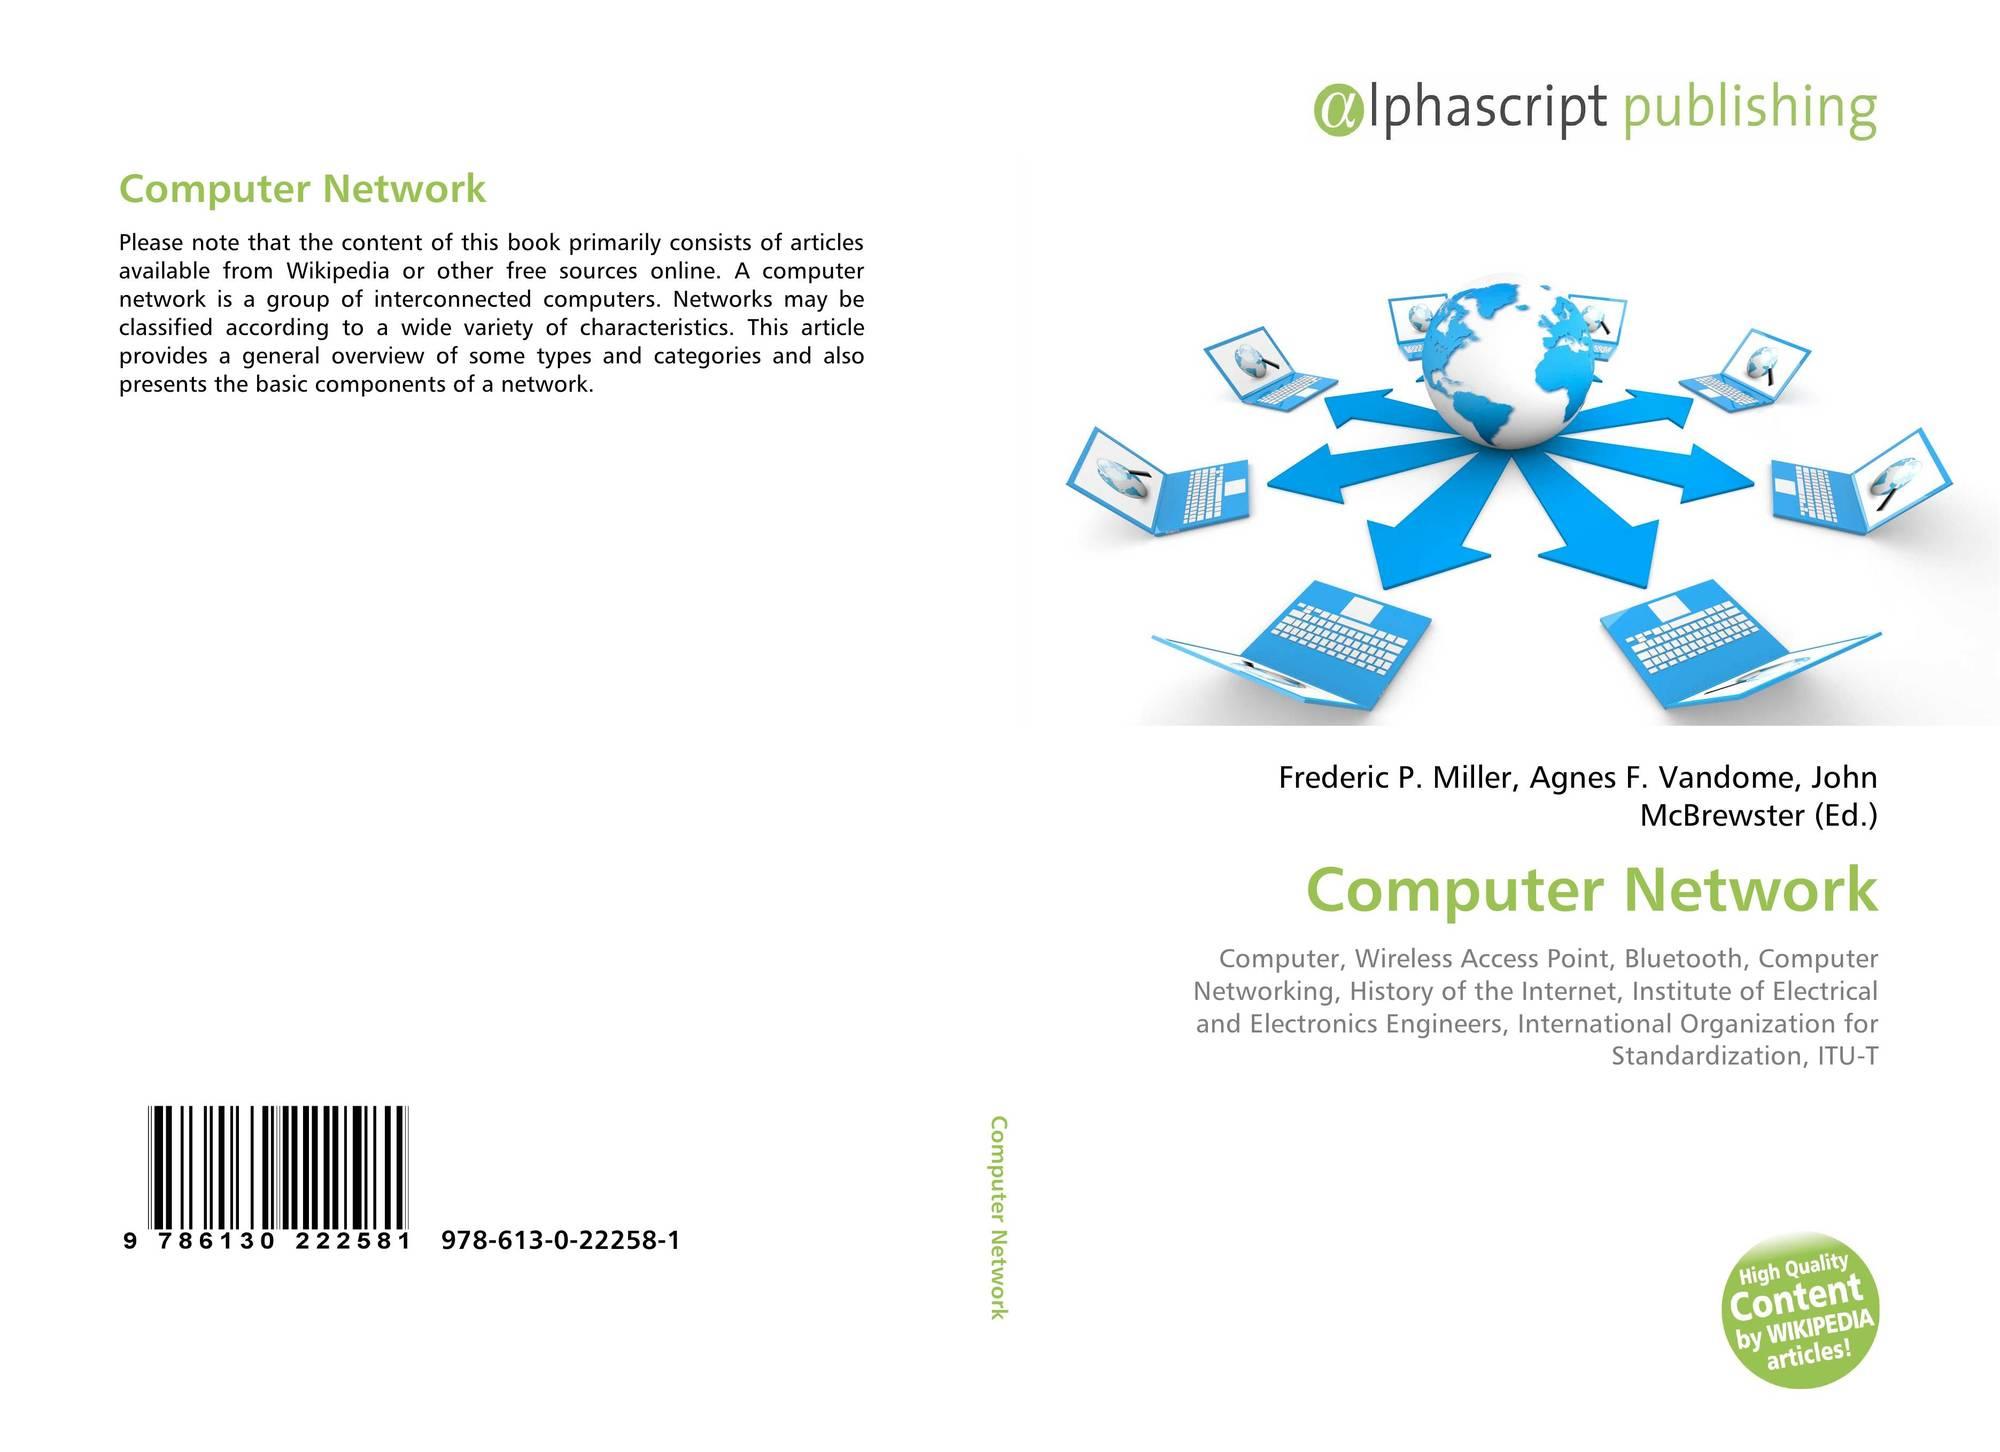 Computer Network, 978-613-0-22258-1, 6130222580 ,9786130222581